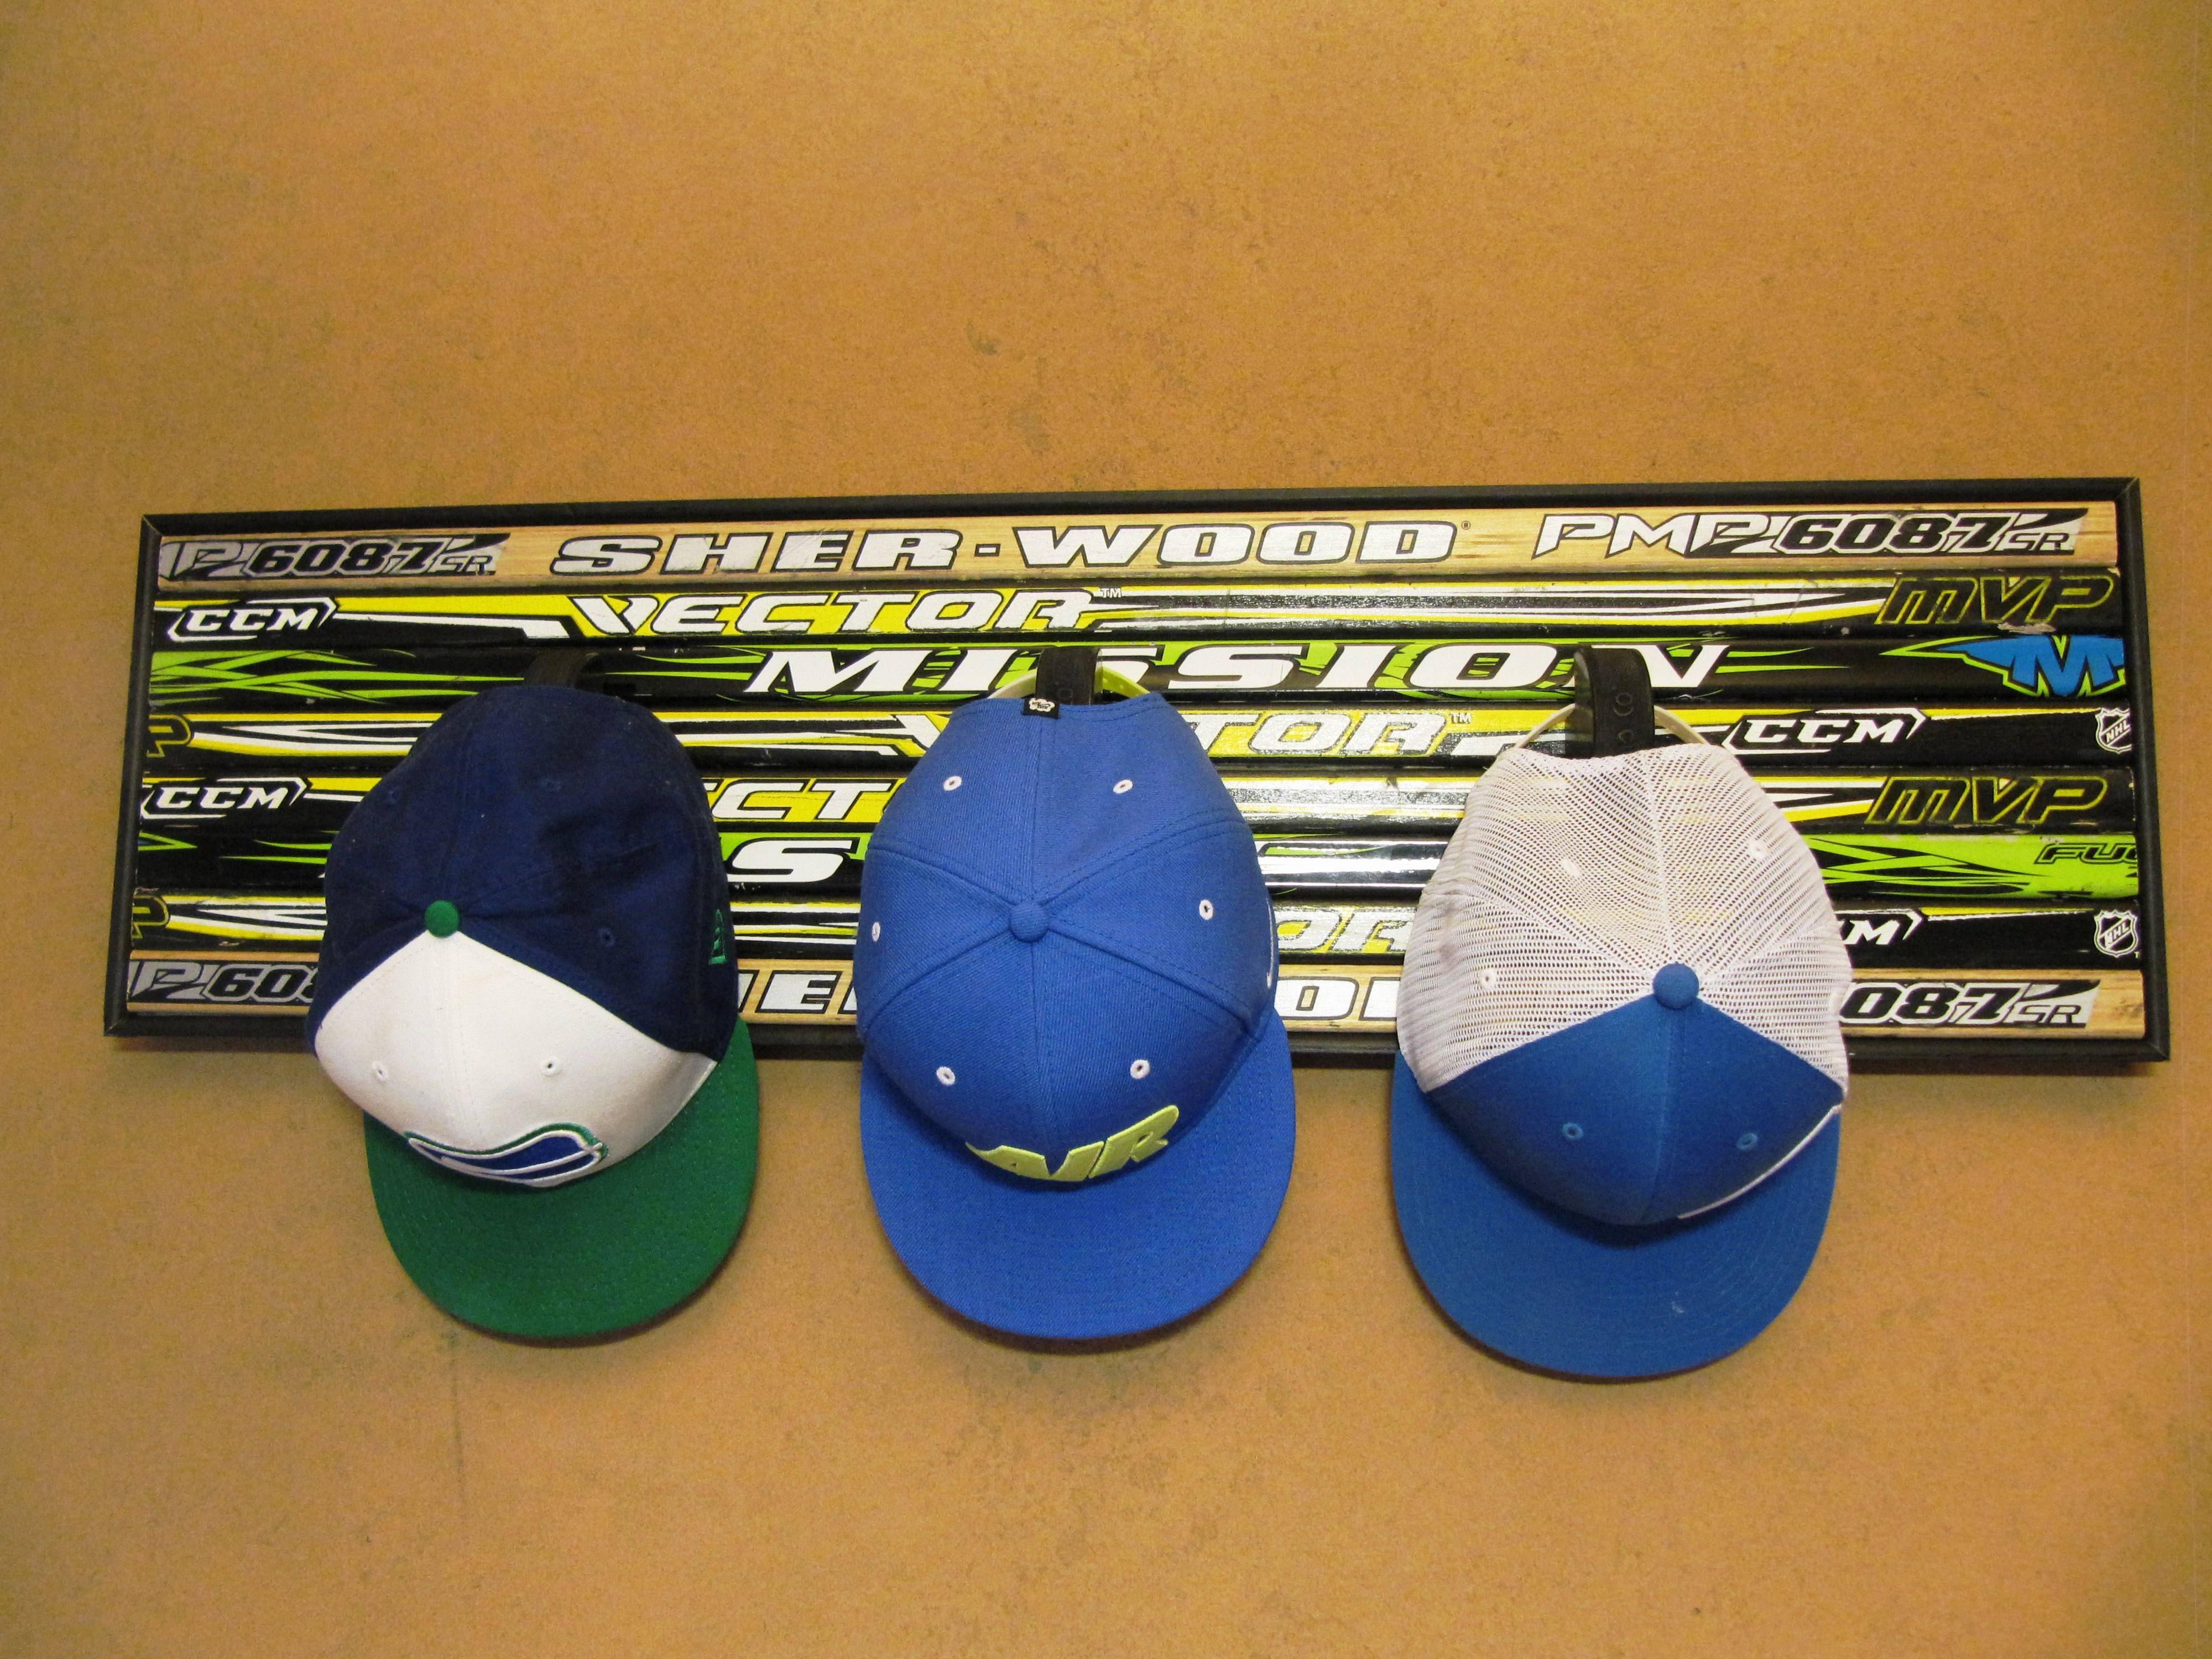 Quotthe Hat Trickquot Custom Built Hat Rack Made Of Old Hockey